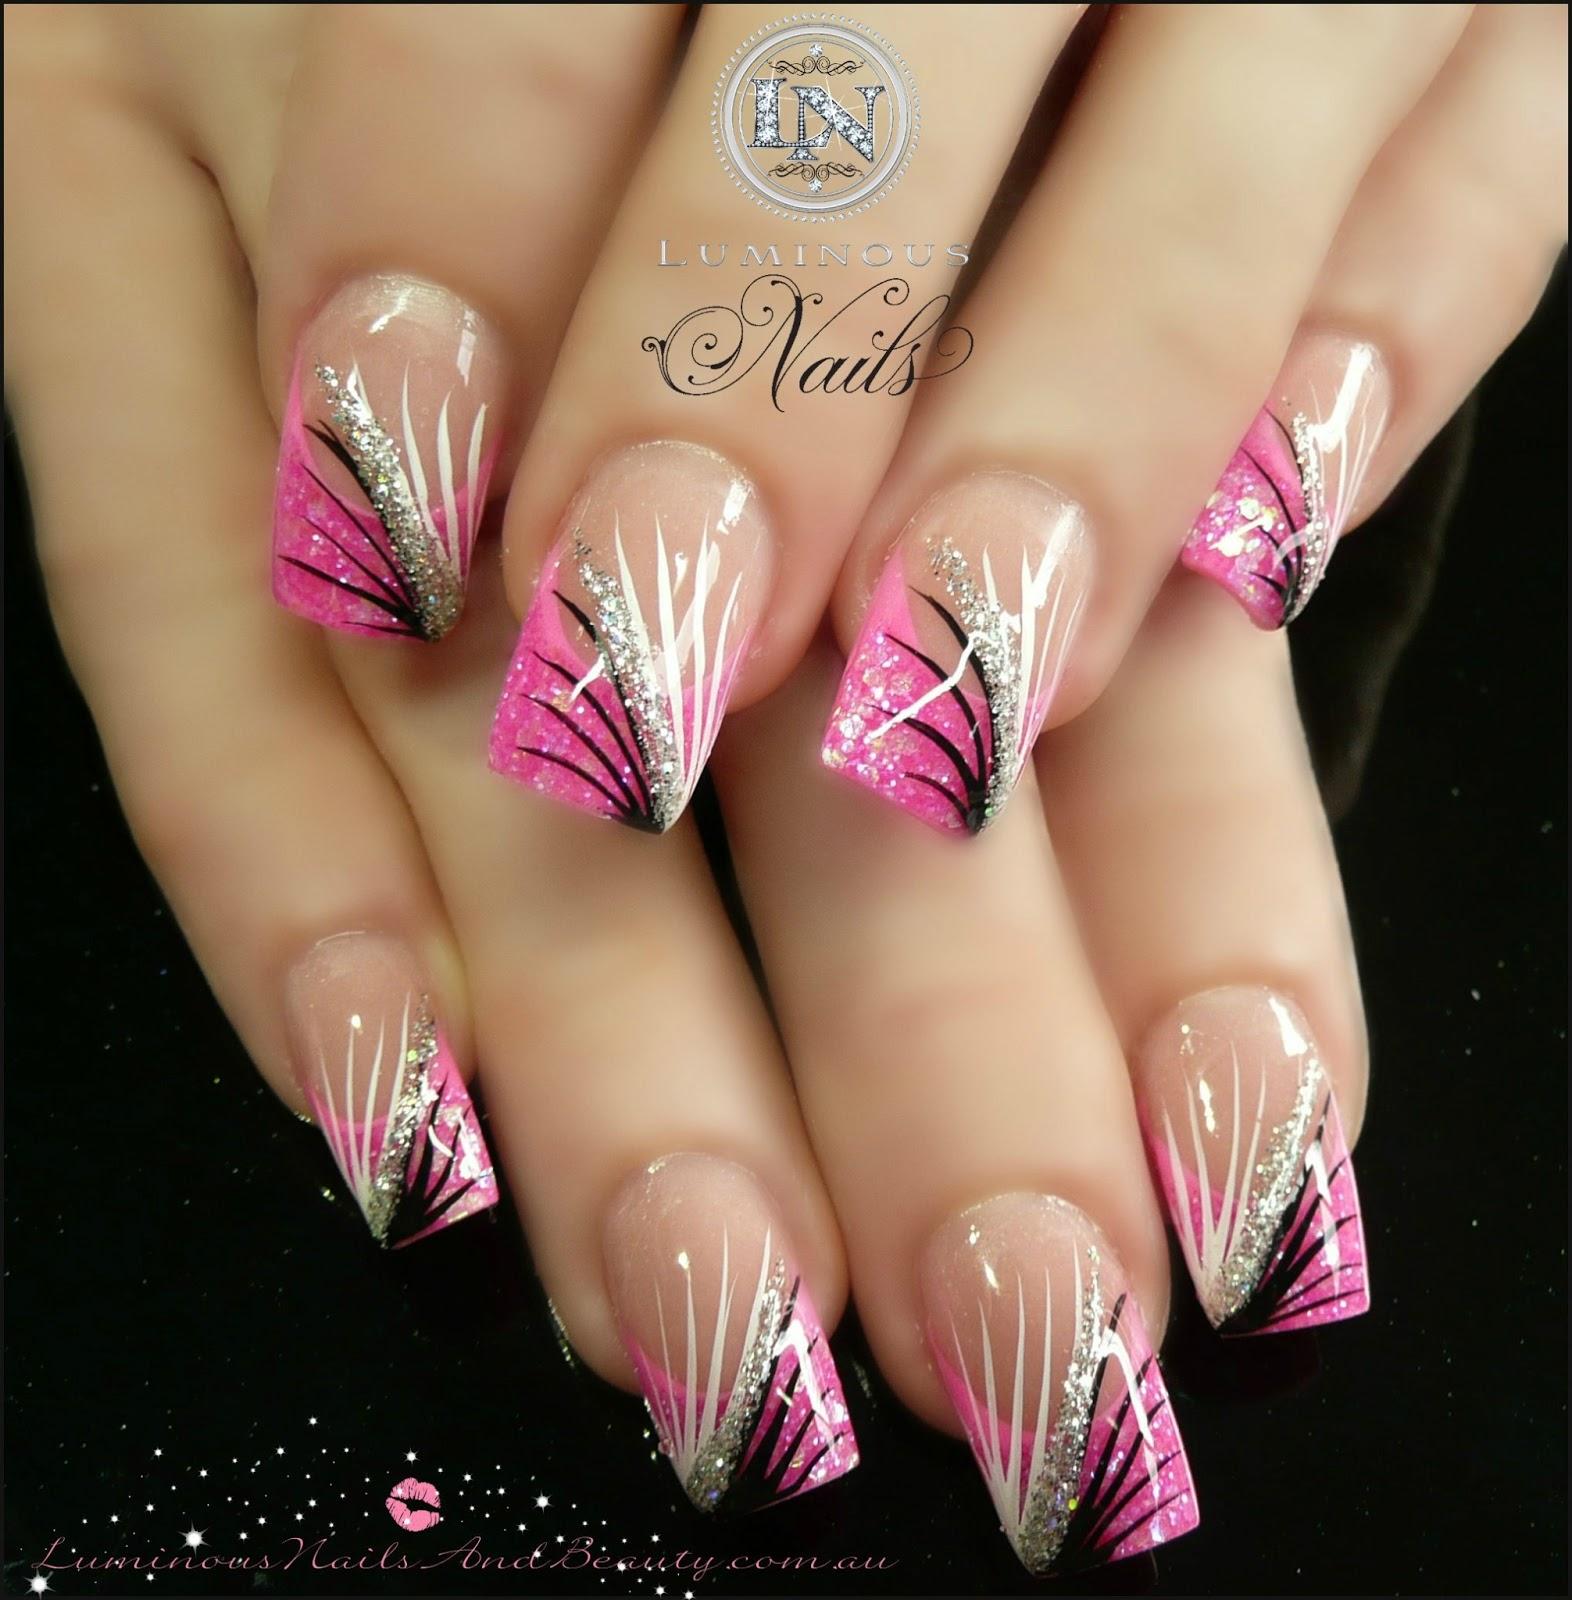 White Nail Polish Toes Tumblr Hession Hairdressing